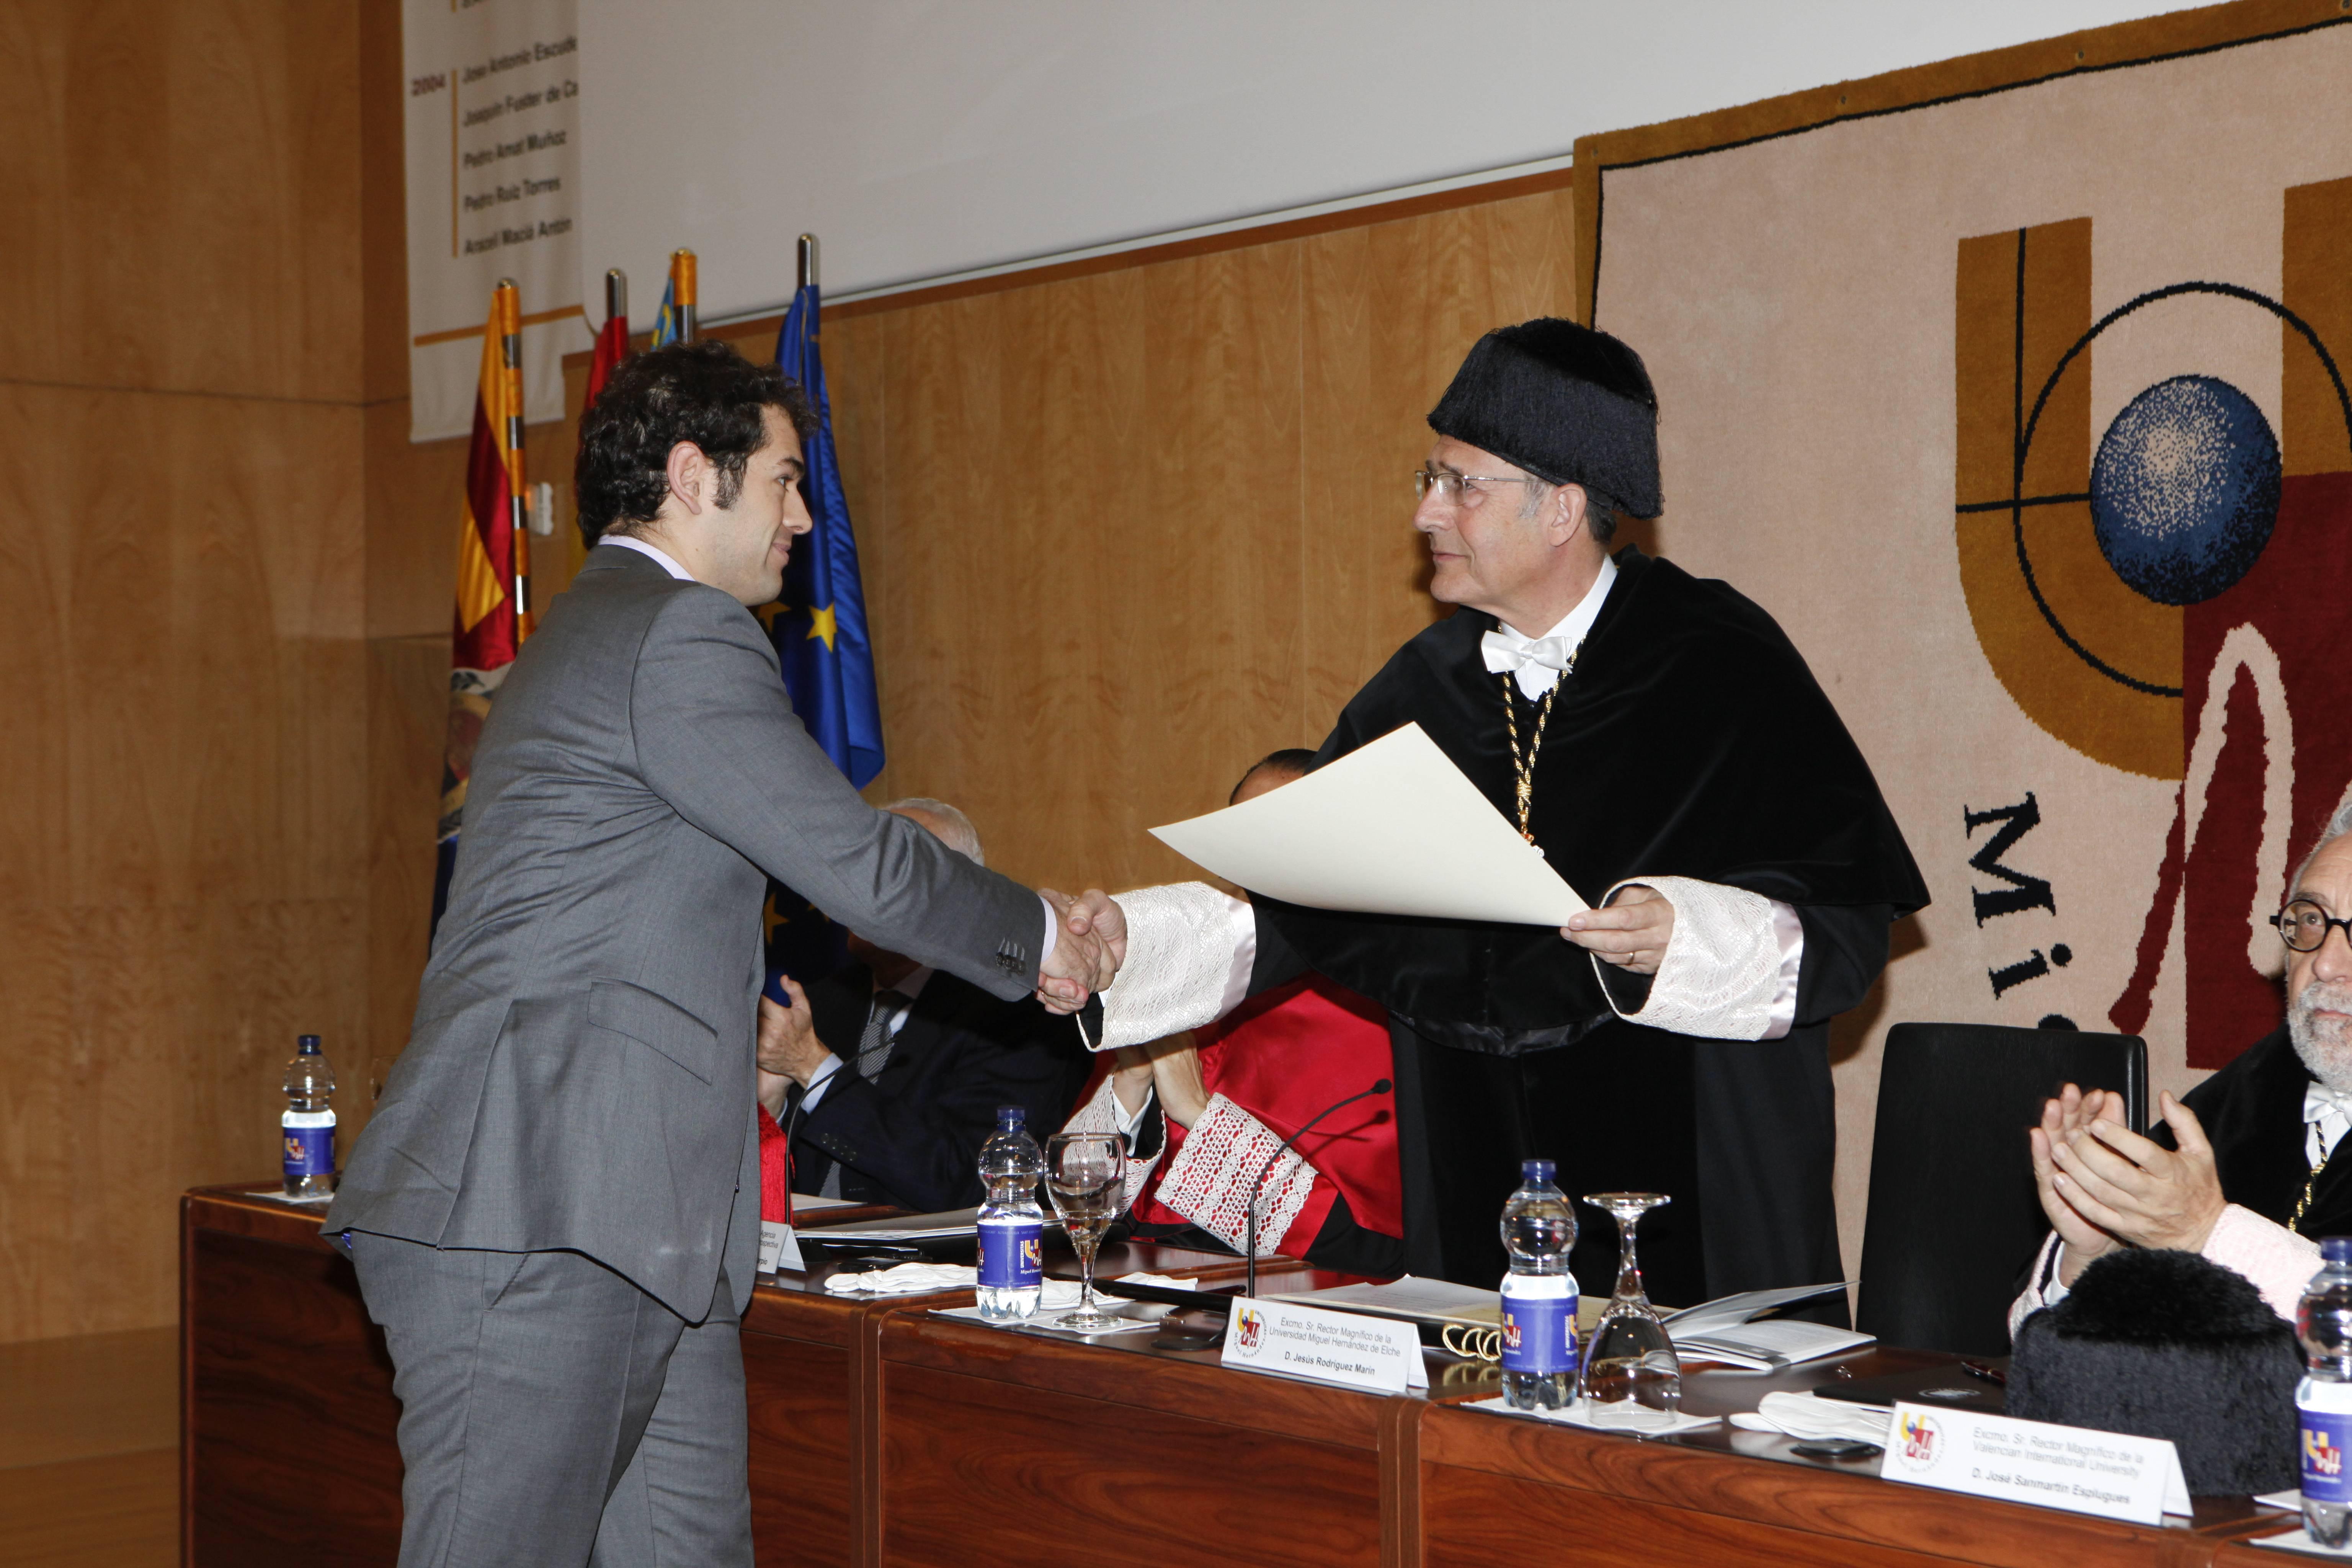 doctor-honoris-causa-luis-gamir_mg_1041.jpg